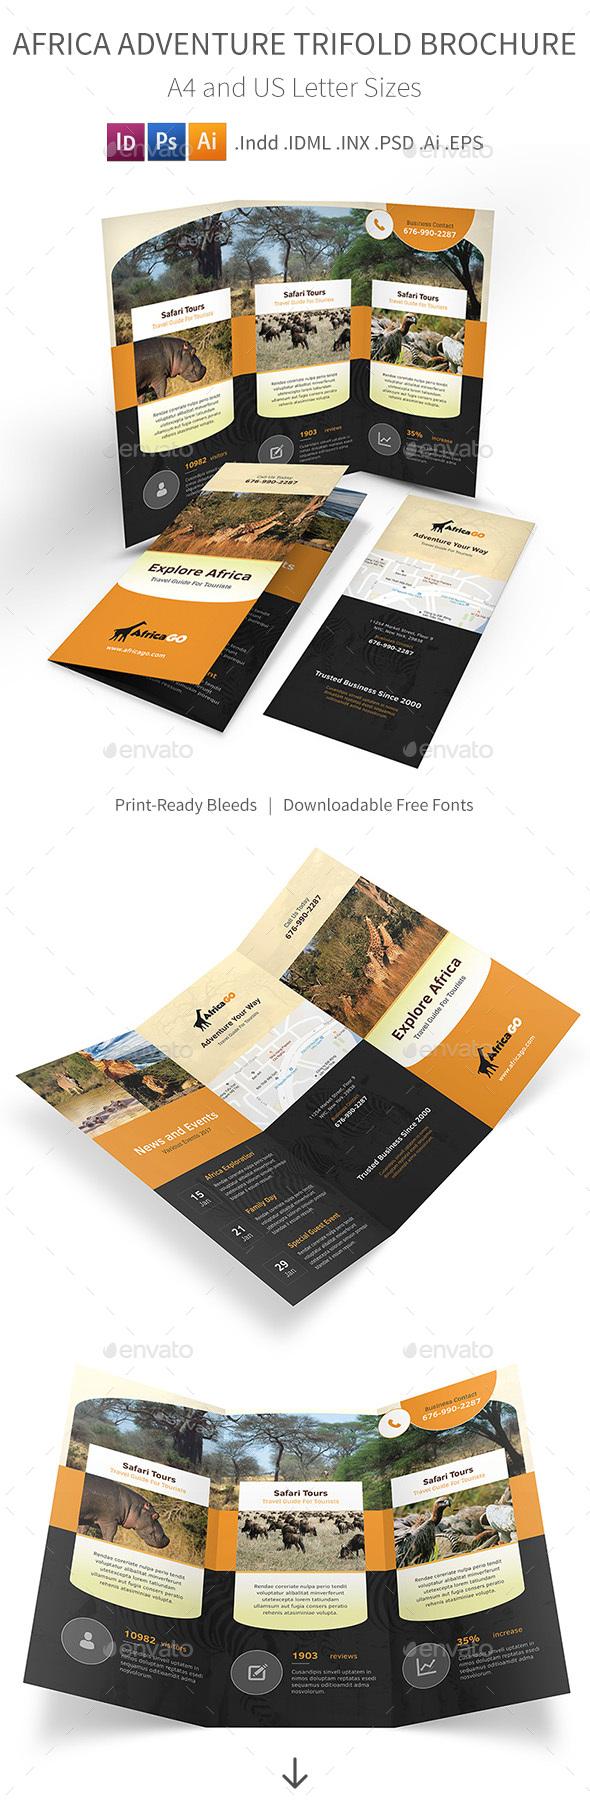 Africa Adventure Trifold Brochure - Informational Brochures